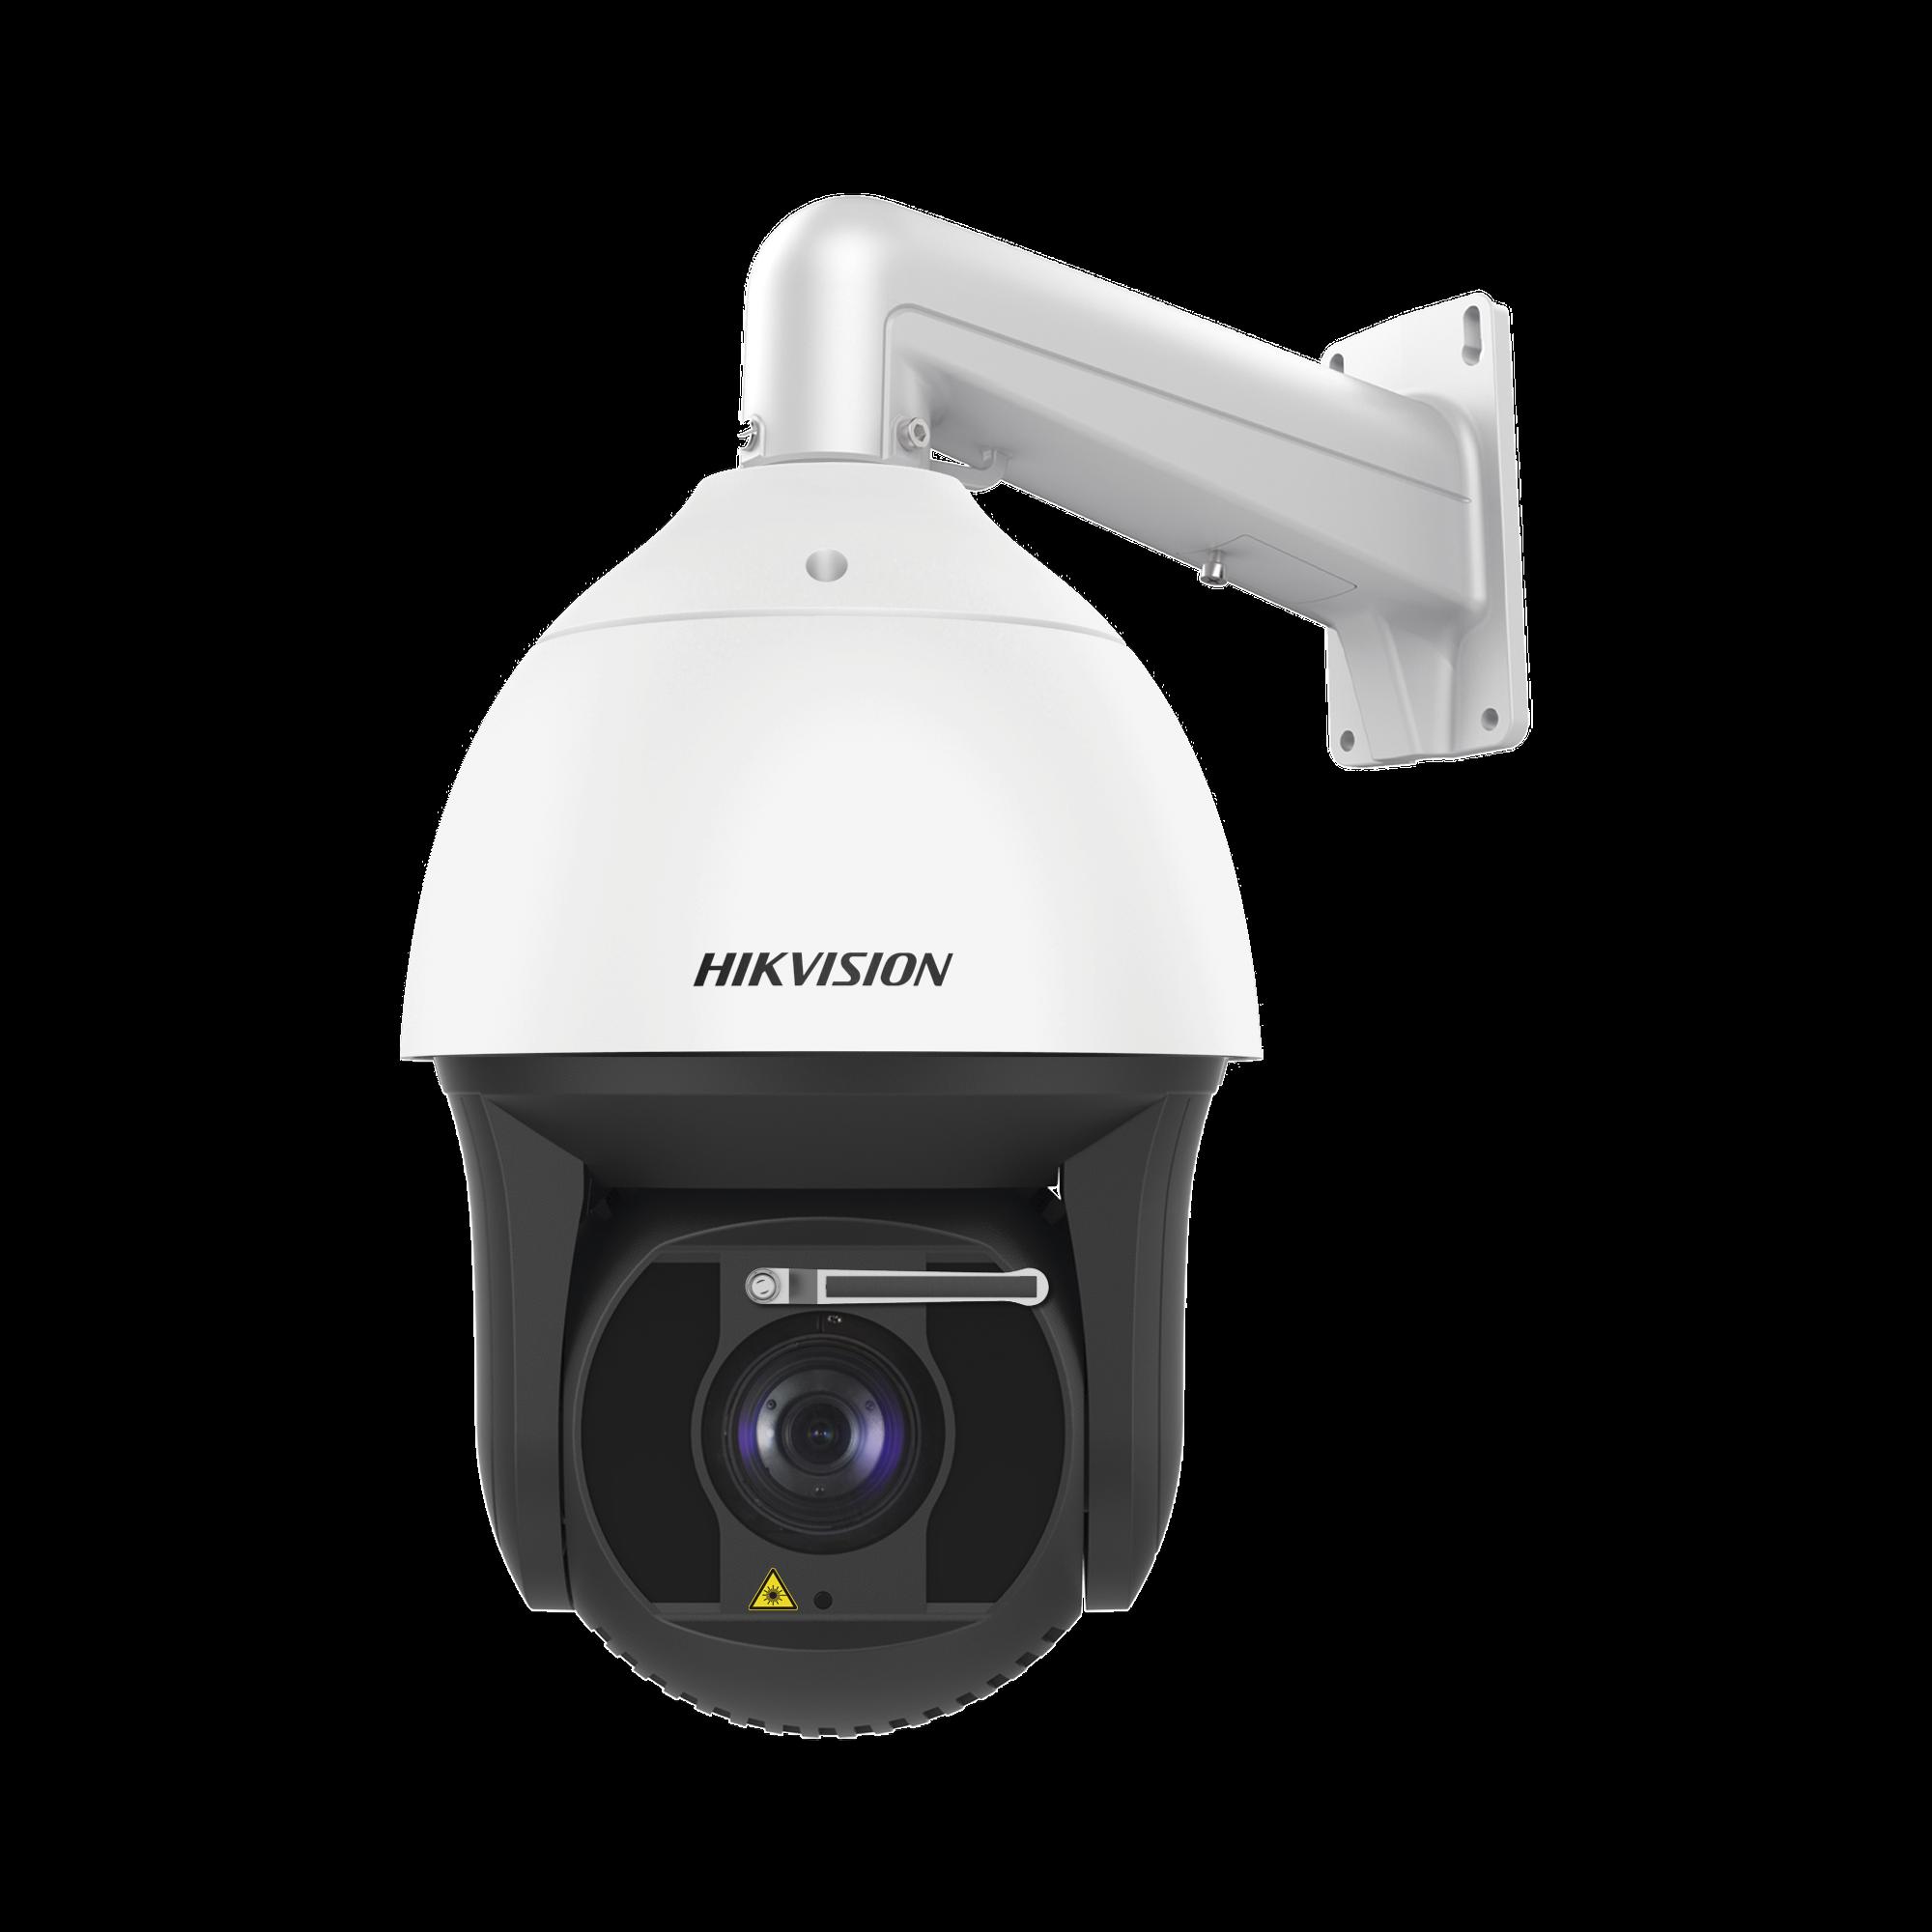 PTZ IP 4 Megapixel / 36X Zoom / 500 mts IR / AutoSeguimiento 2.0 / WDR 140 dB / Hi-PoE / EIS / Captura de Rostros / Exterior IP67 / Rapid Focus